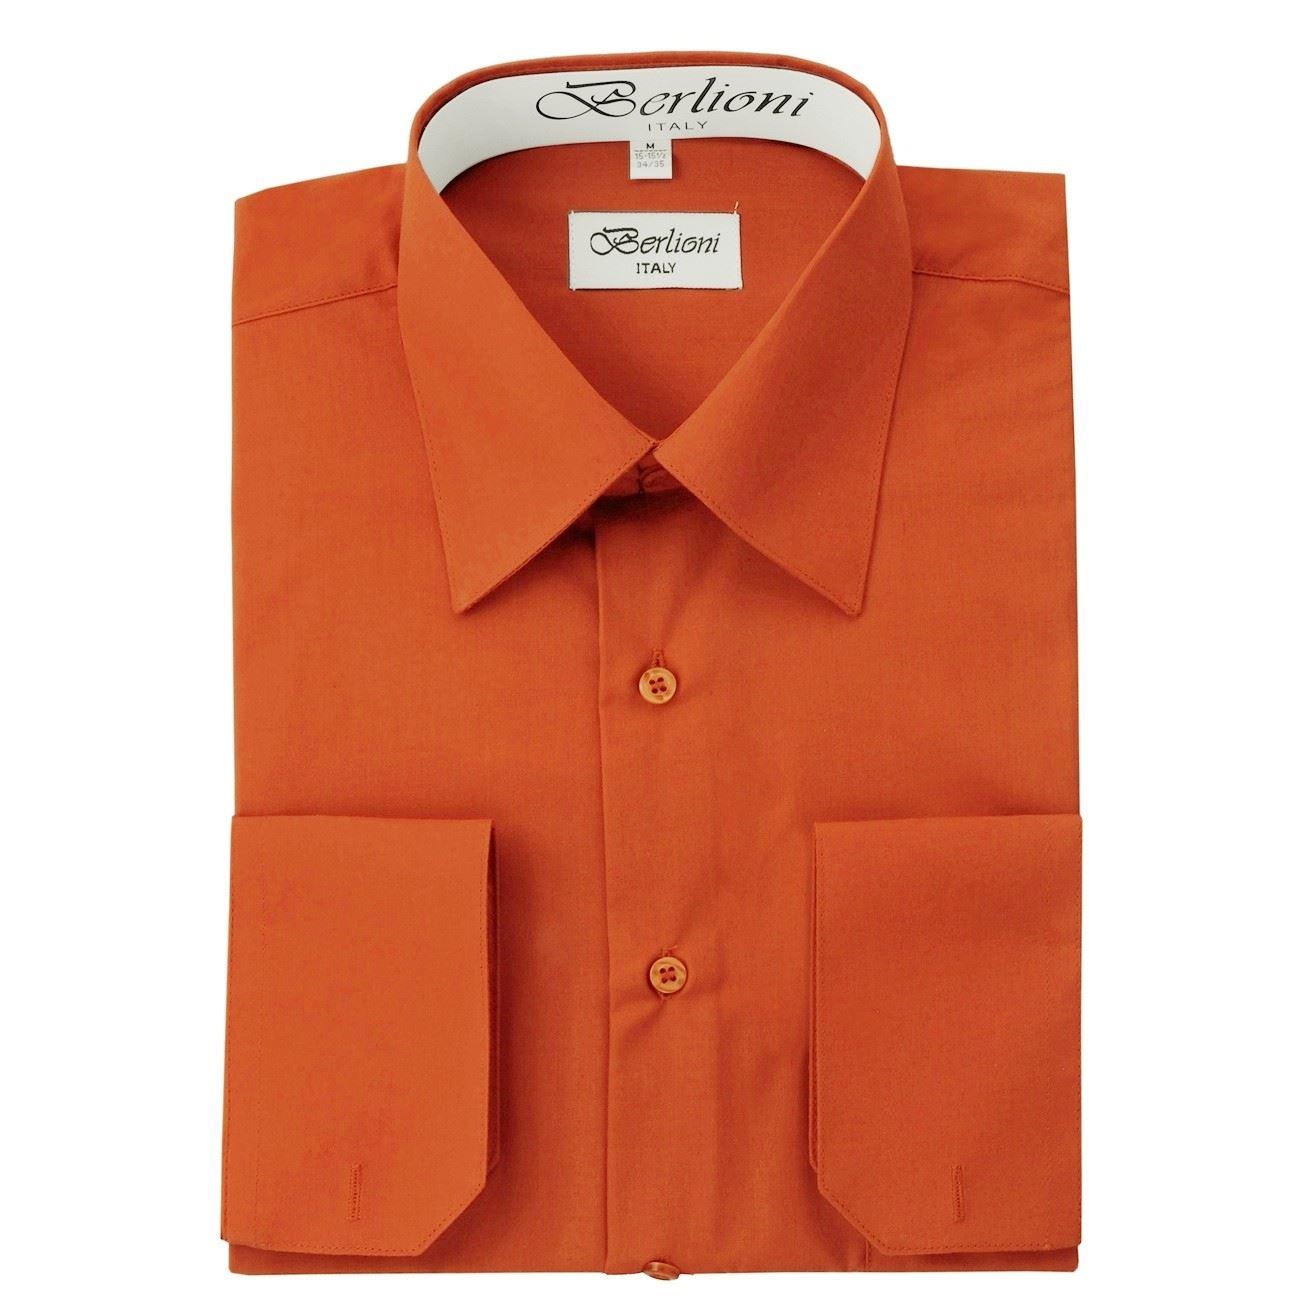 Berlioni italy men 39 s dress shirt convertible french cuffs for Mens dress shirts sizes